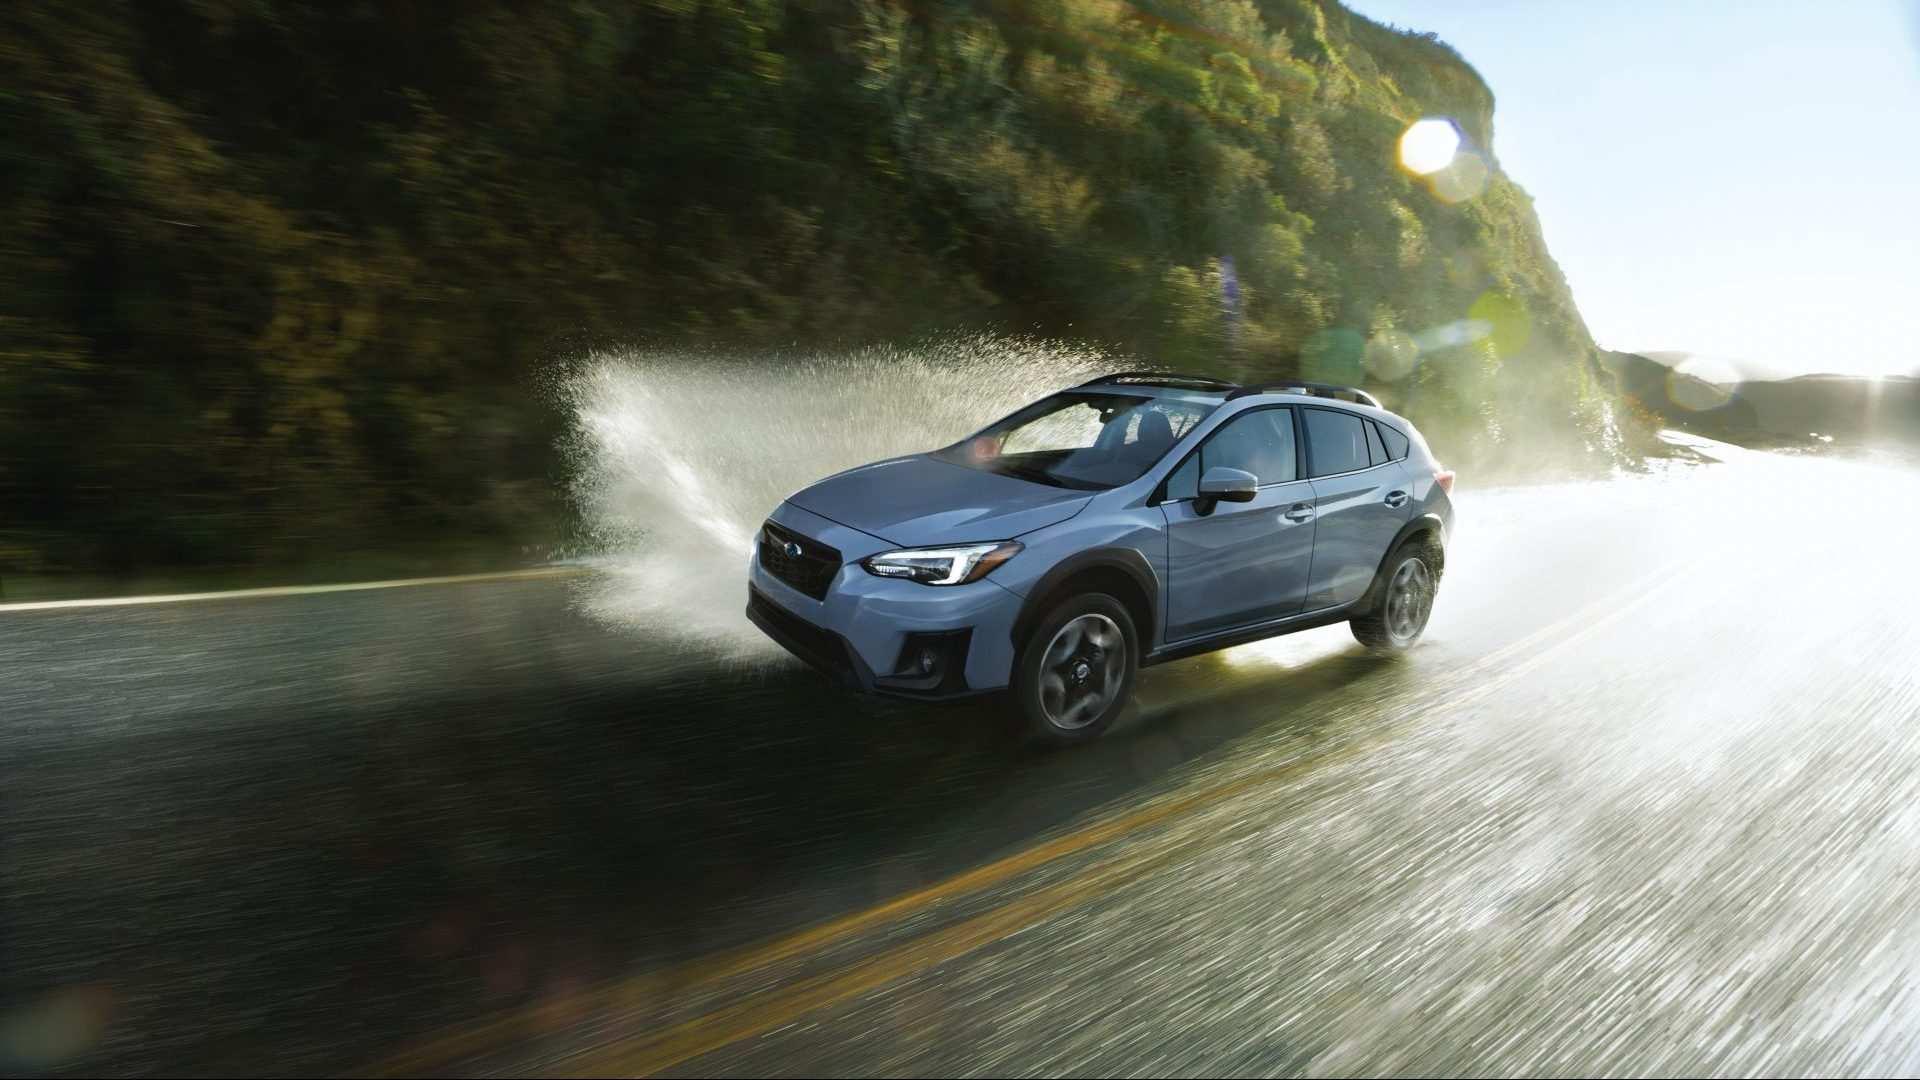 96 Gallery of 2019 Subaru Evoltis Images for 2019 Subaru Evoltis